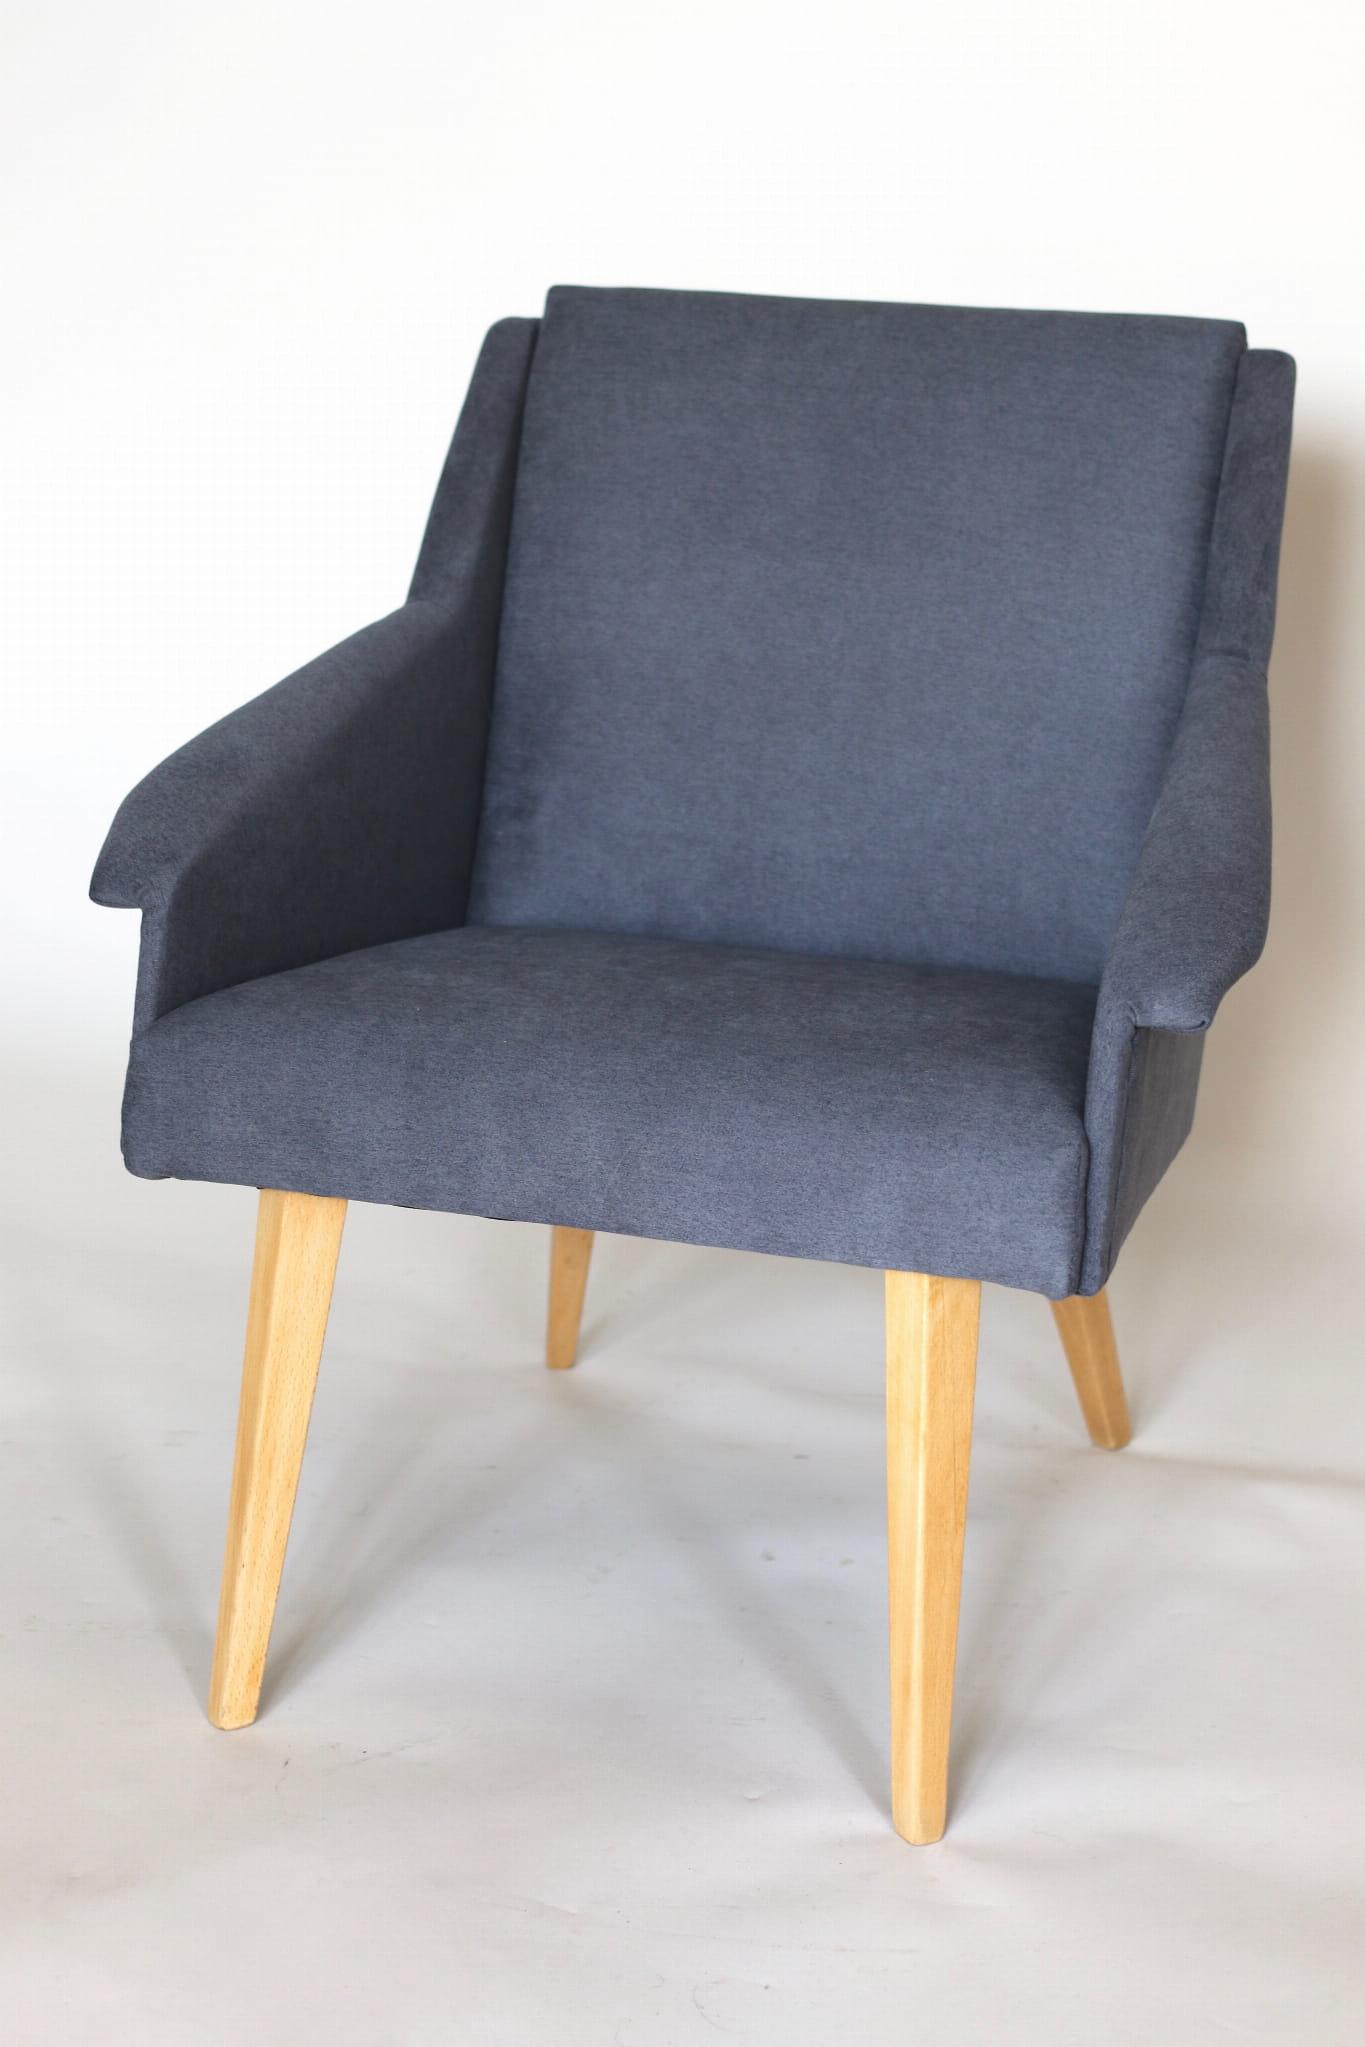 Fotel Klubowy Szary Lata 70